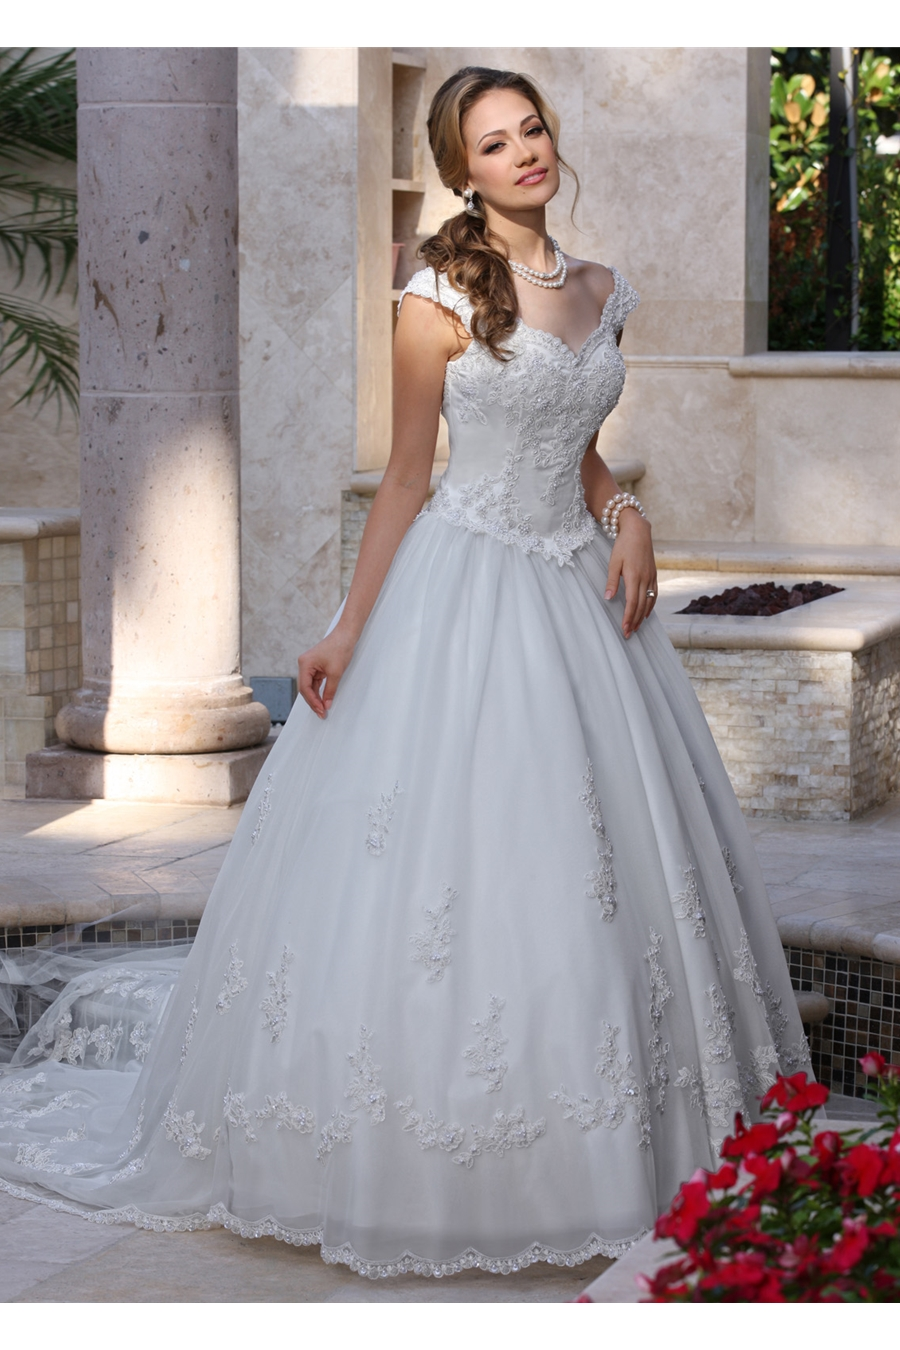 Blu by Mori Lee Wedding Dress Style 5515/Matilda | House of Brides